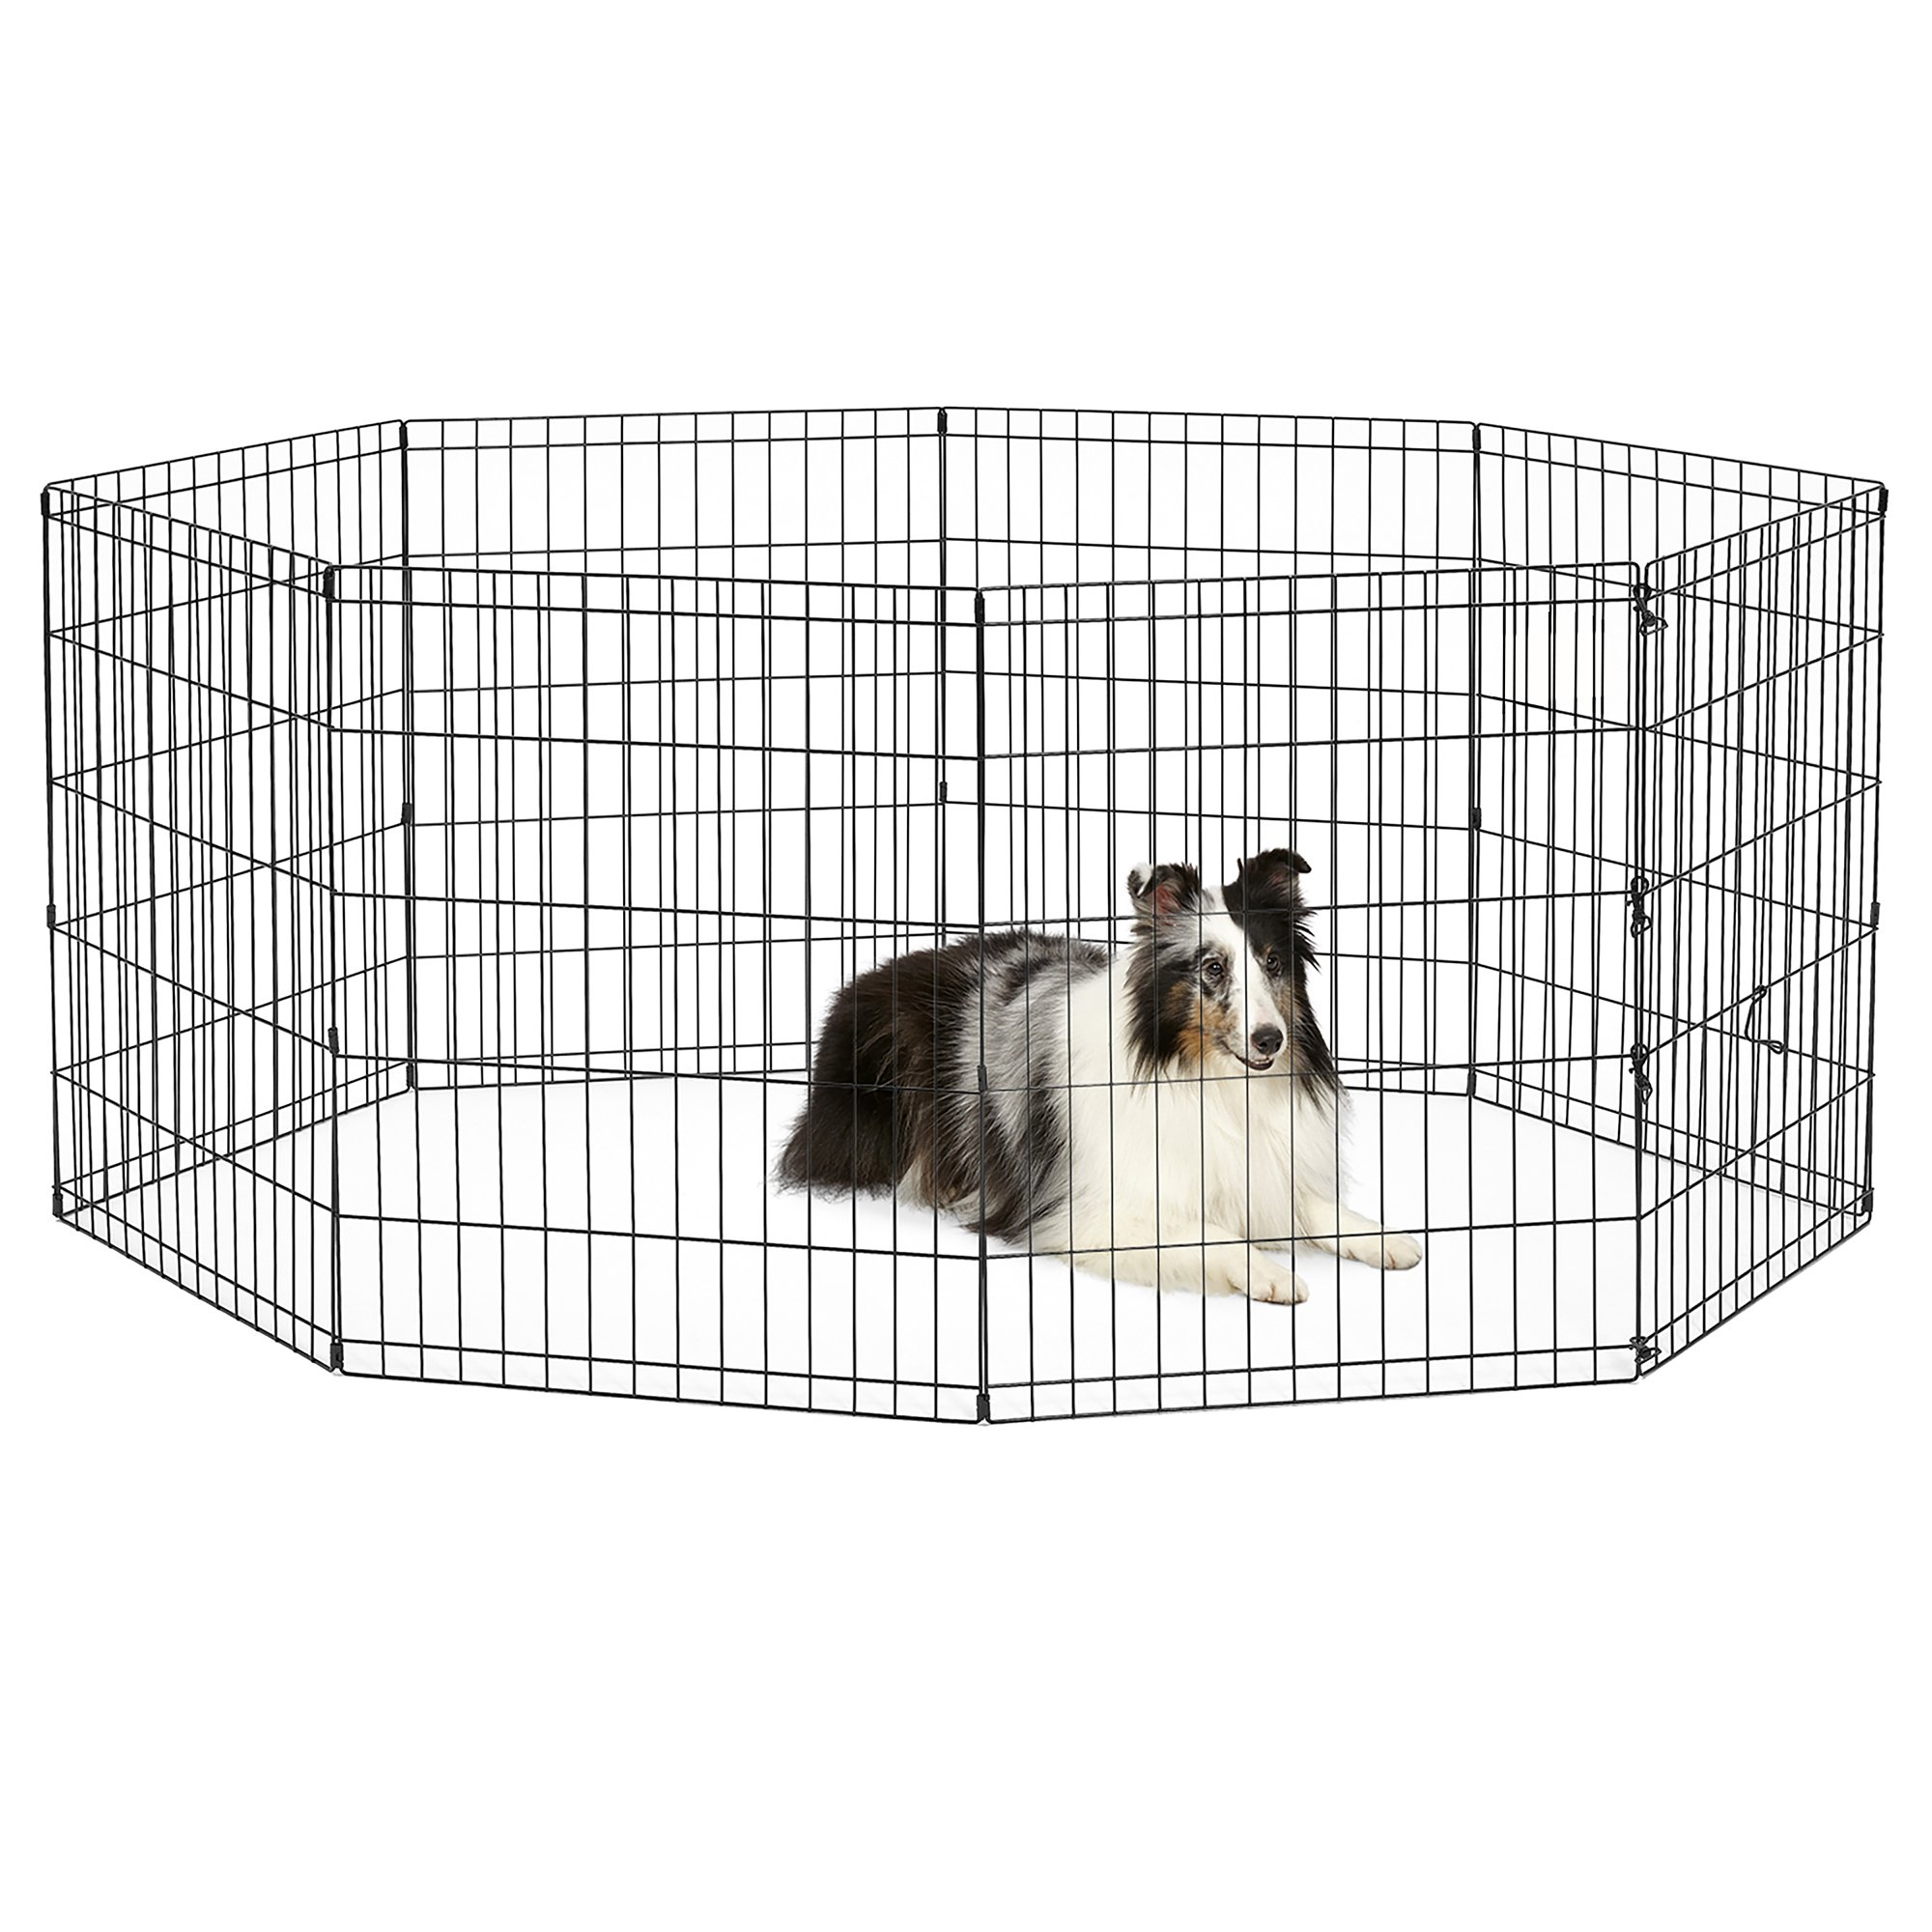 "New World Pet Products B552-30 Foldable Exercise Pet Playpen, Black, Medium/24"" x 30"" product image"